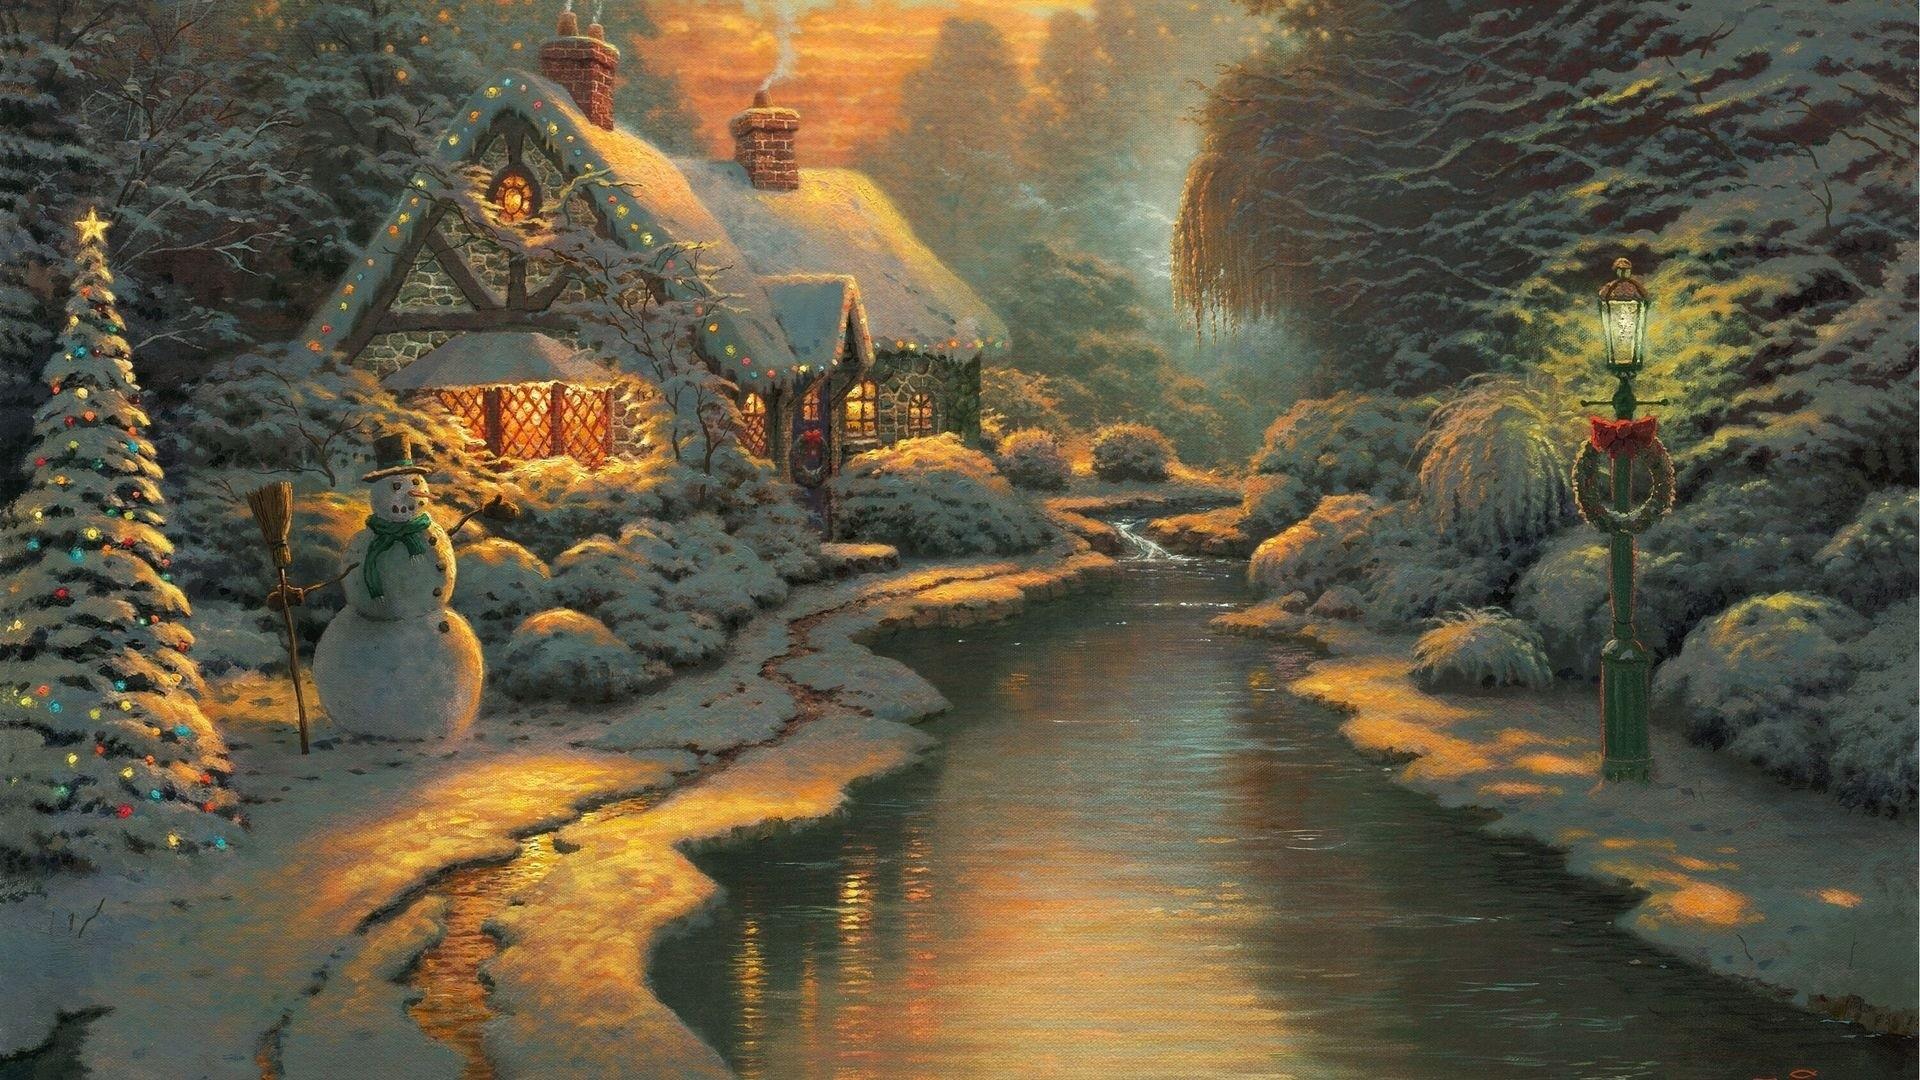 Thomas Kinkade Desktop Wallpaper Christmas 61 images 1920x1080